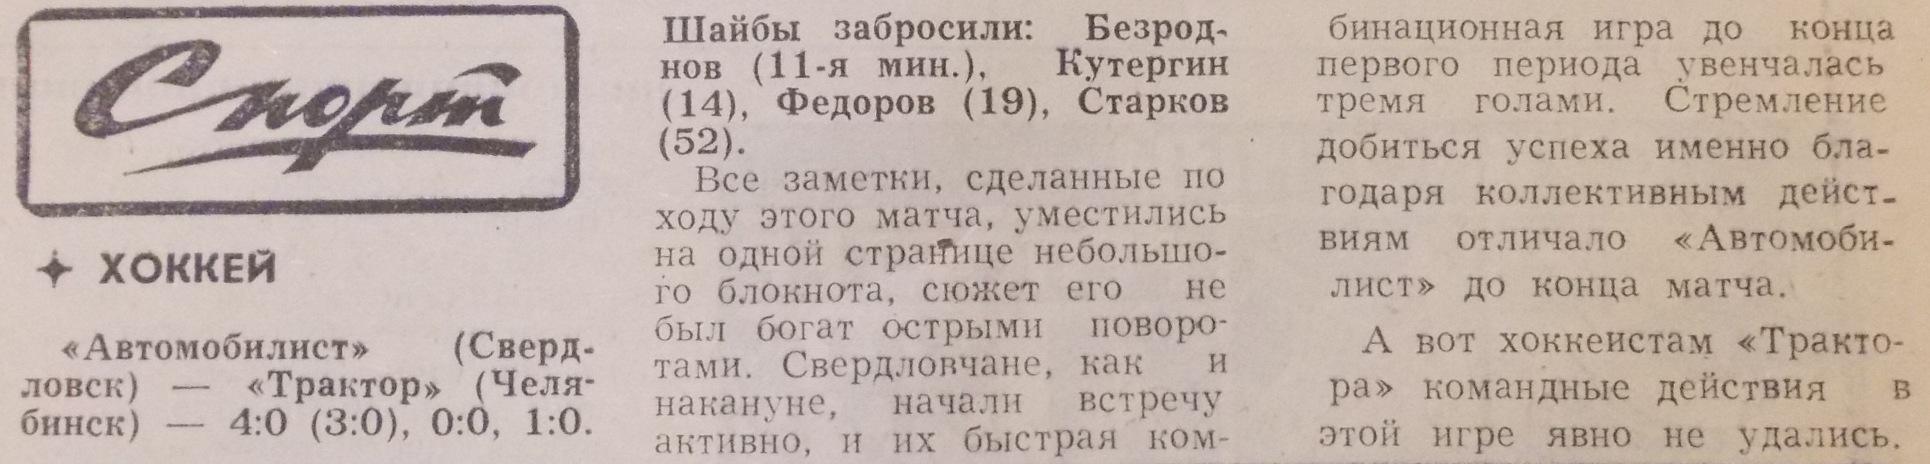 №168(12307) от 01.09.1984 Хоккей ТМ.JPG